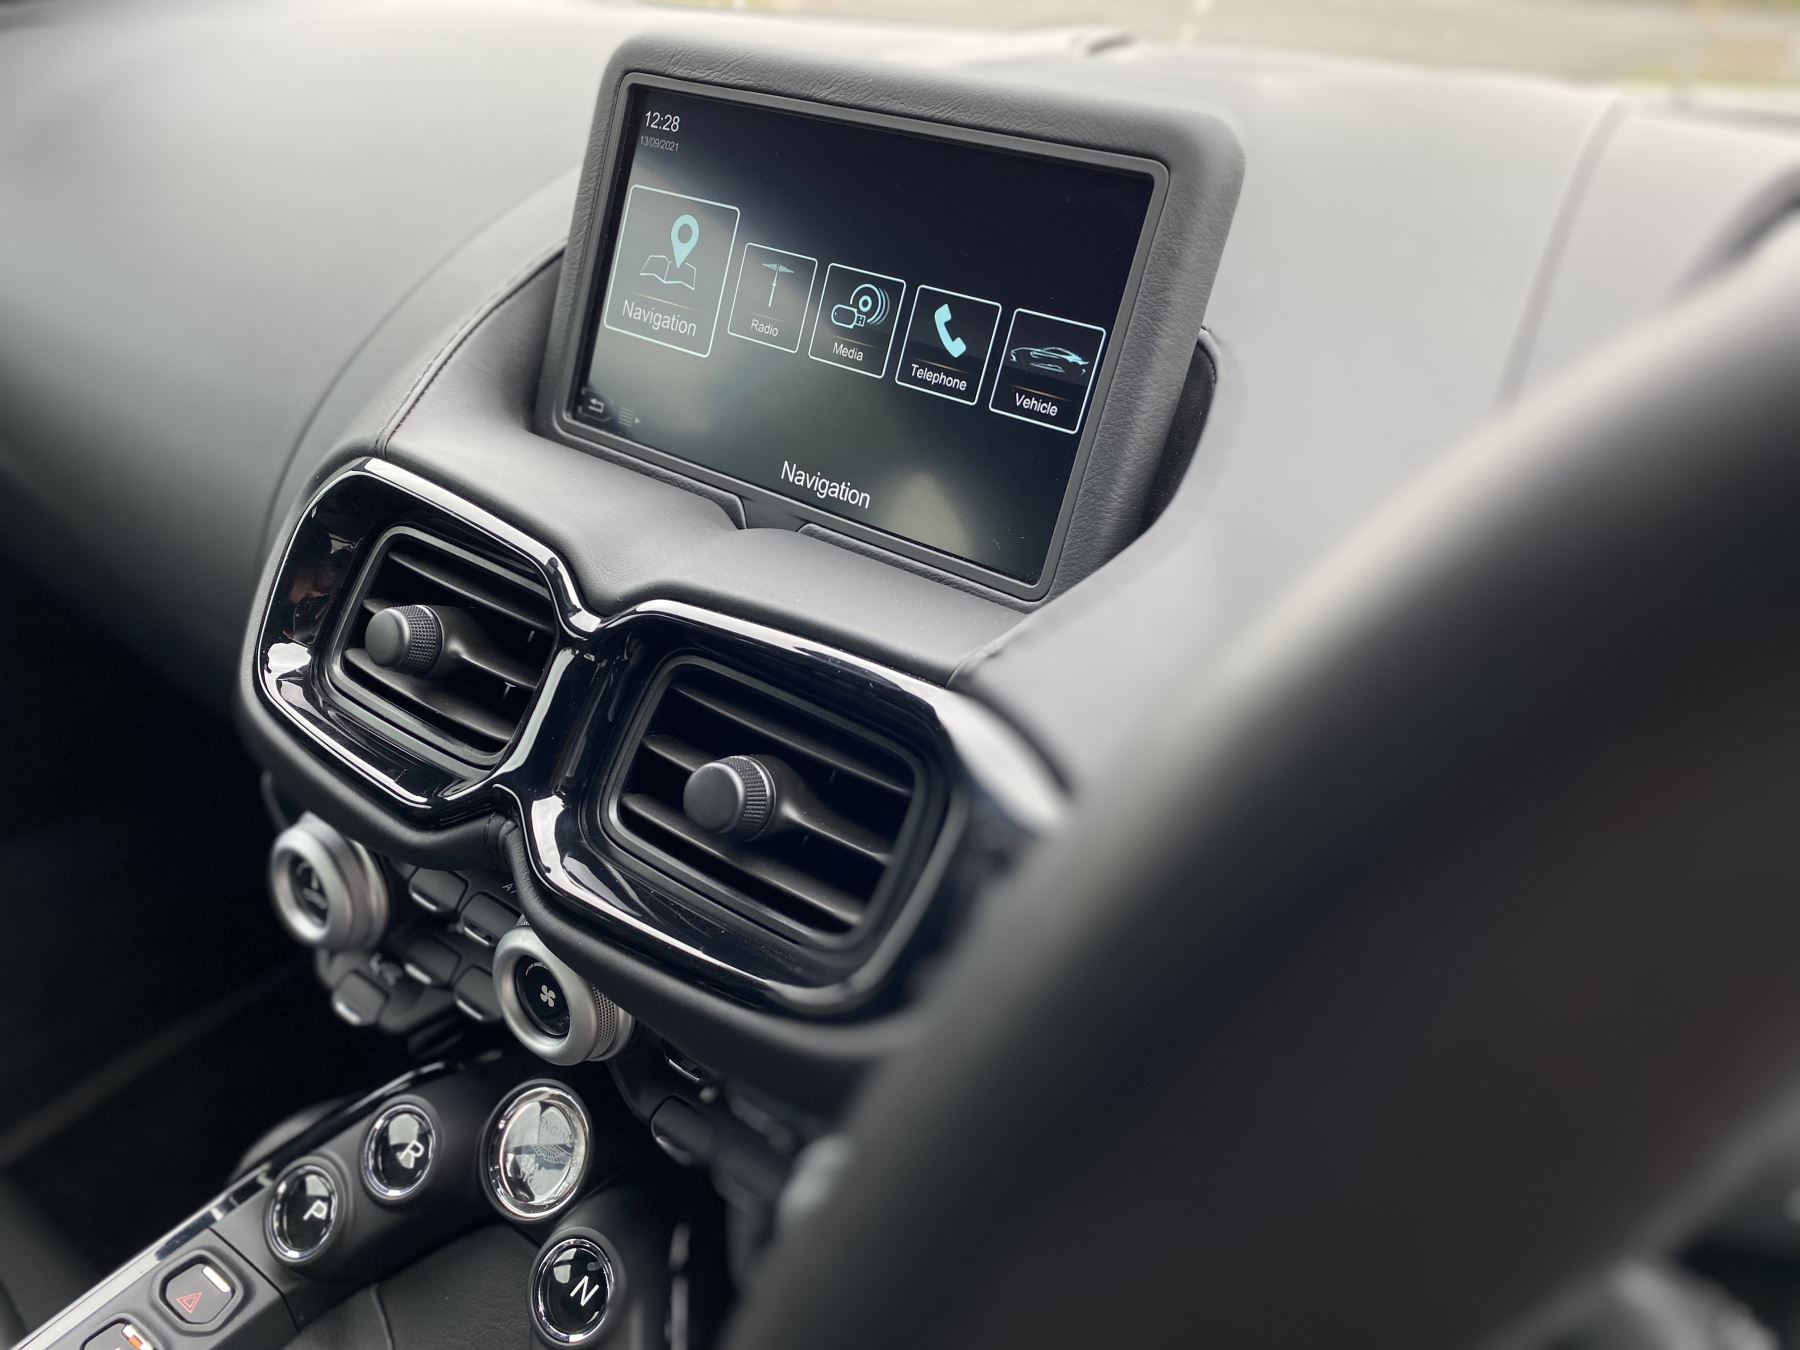 Aston Martin New Vantage 2dr ZF 8 Speed Auto. 4.0 Twin Turbo ZF Gearbox  Reversing Camera Heated Seats Ceramic Brakes image 30